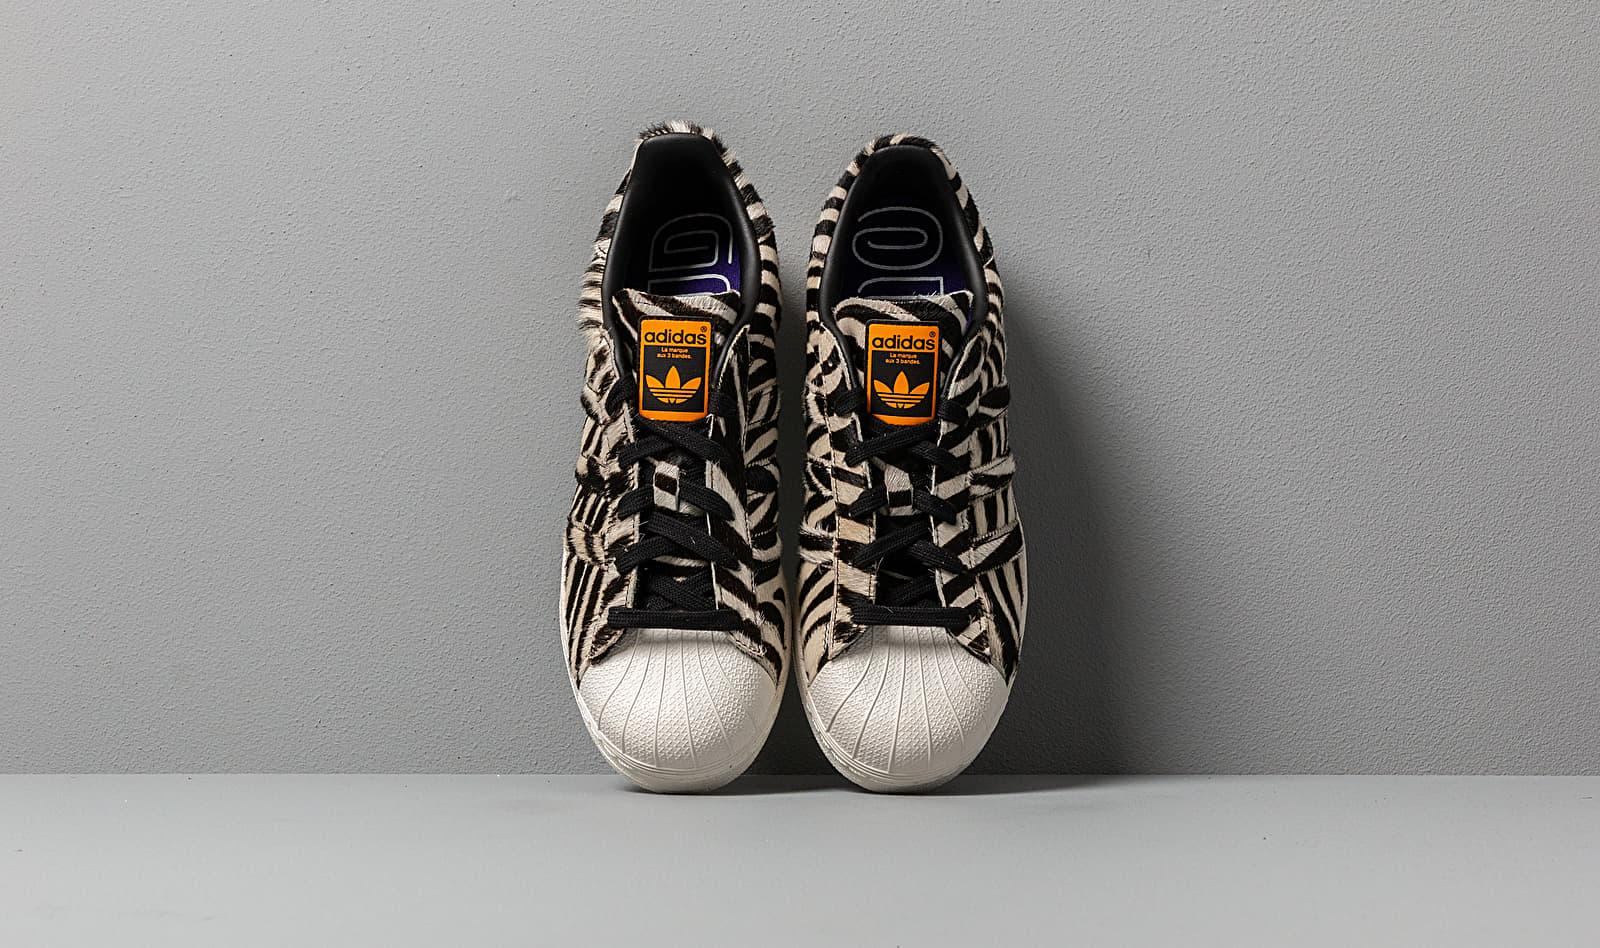 best website d9c8c 5843e adidas Originals Adidas Superstar W Core Black  Off White  Core Purple in  Black - Lyst